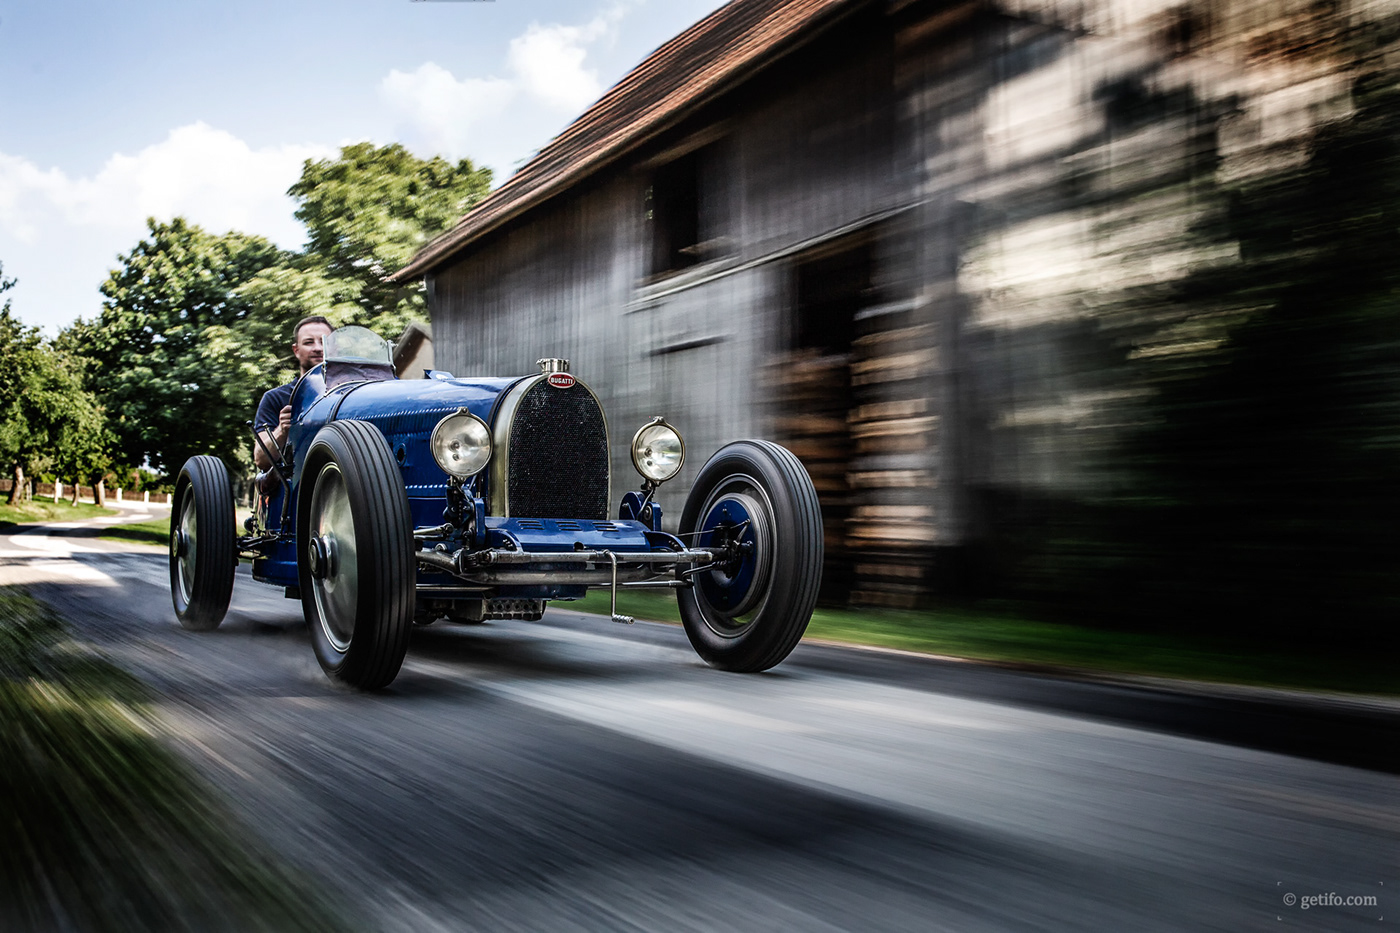 bugatti bugatti51 getifo historicalracecar oldtimer prettyfast rigshot